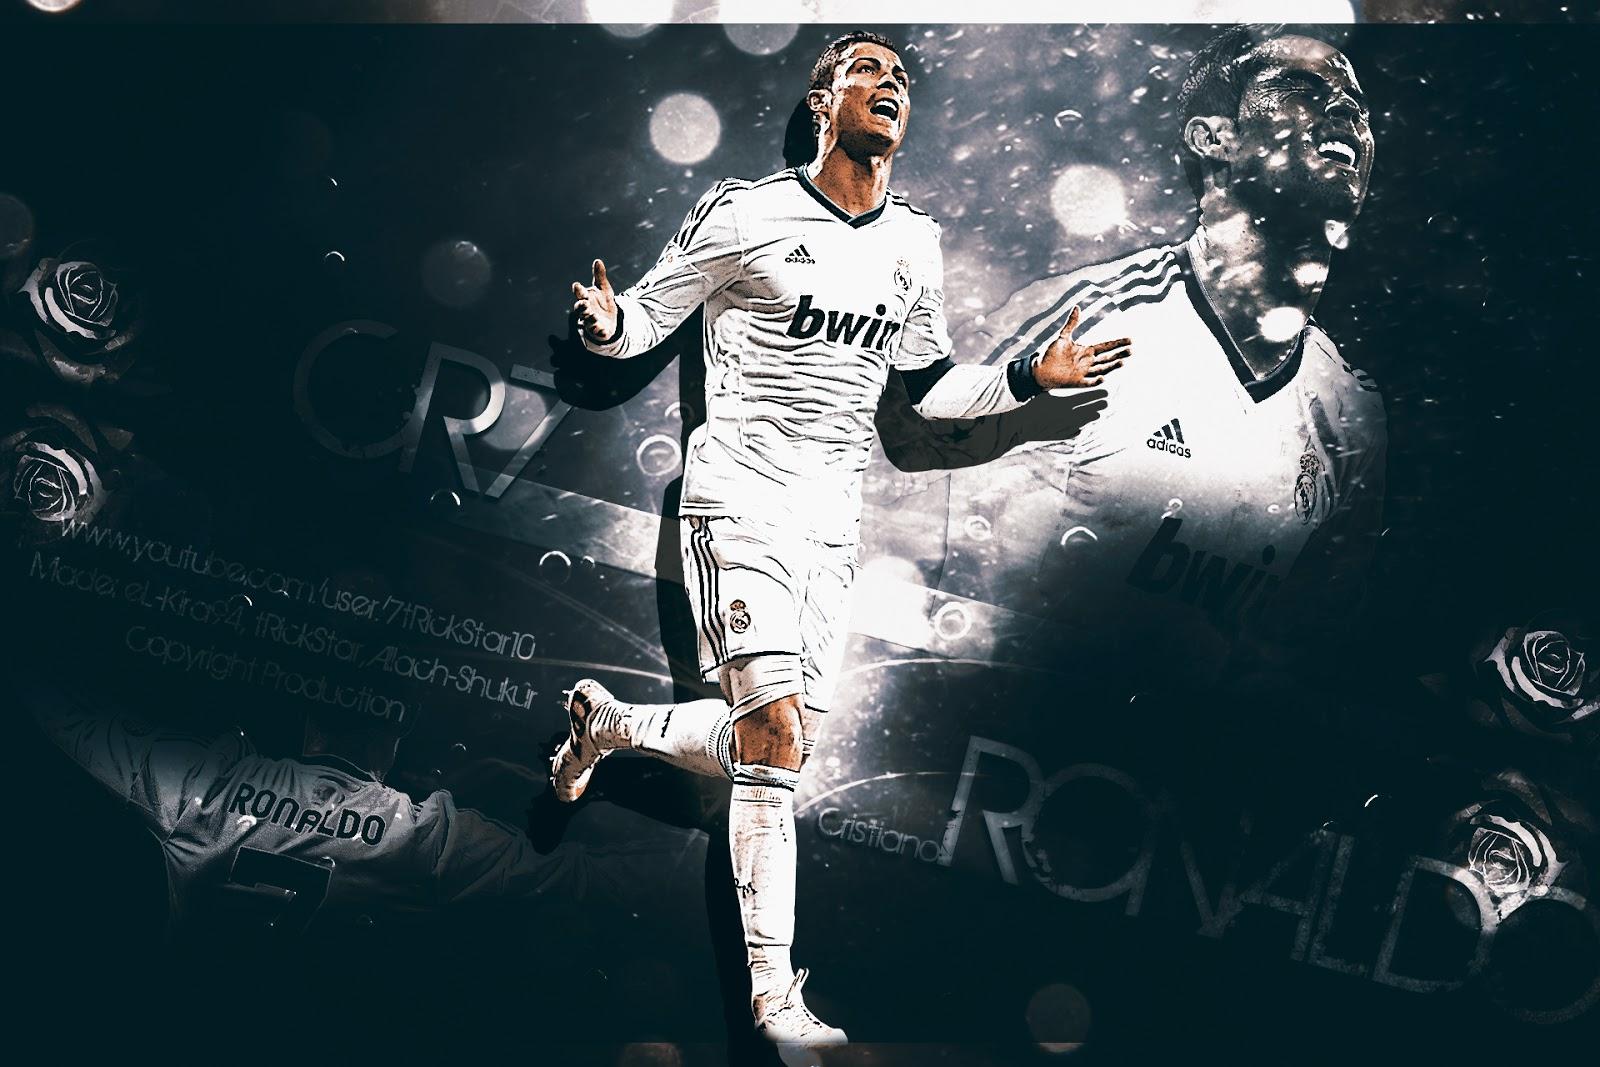 Cristiano Ronaldo New HD Wallpapers 2014 2015 Football 1600x1067